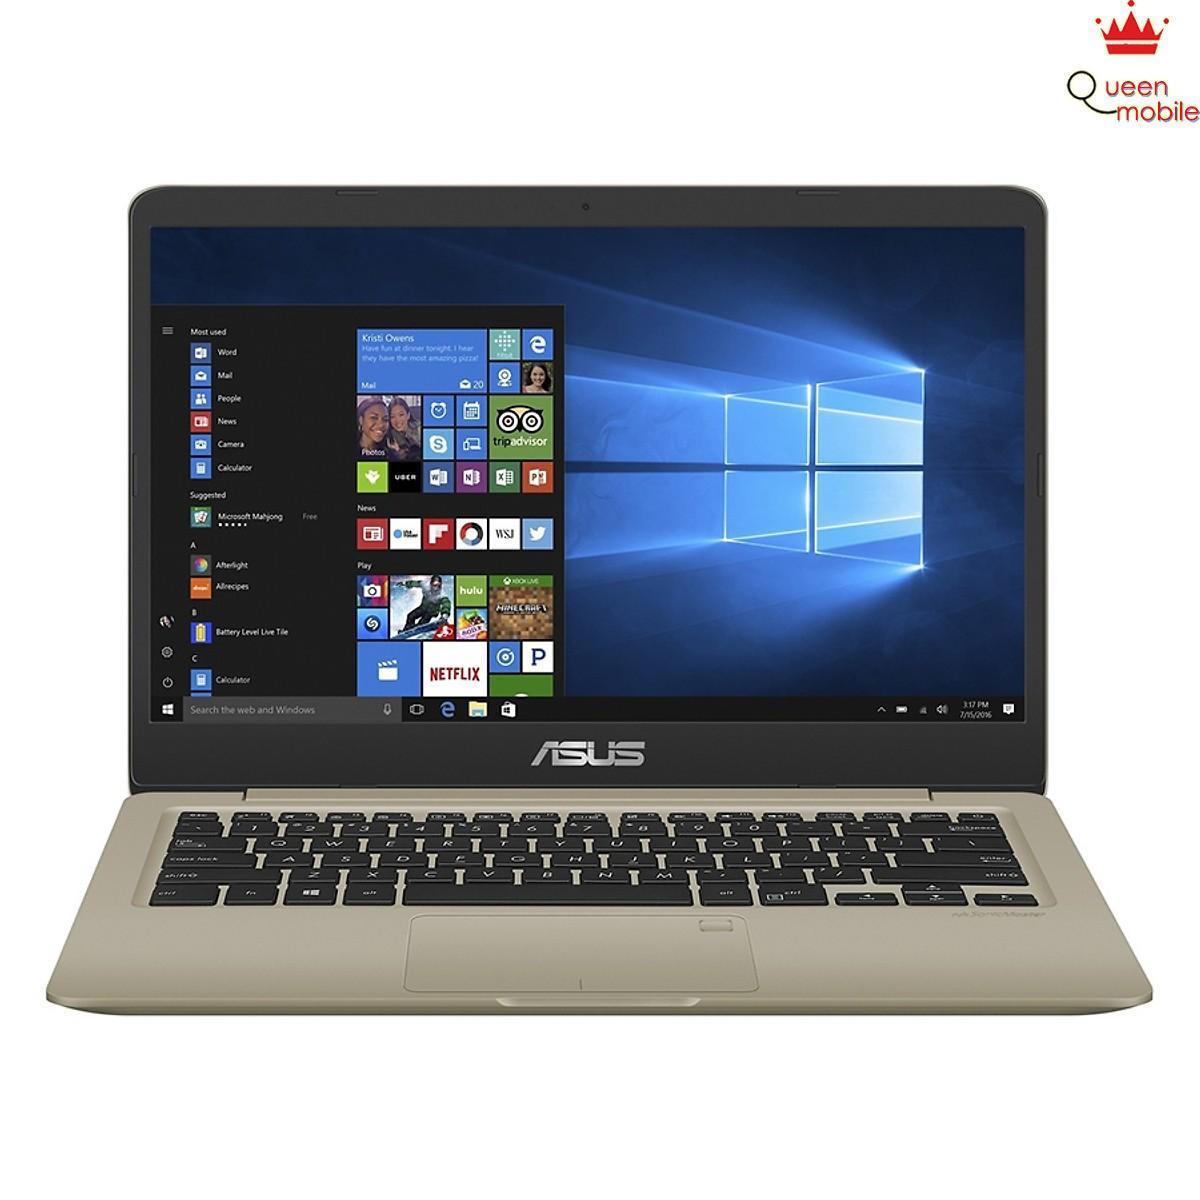 Laptop Asus Vivobook S14 S410UN-EB279T Core i5-8250U/Win10 (14 inch) (Gold)